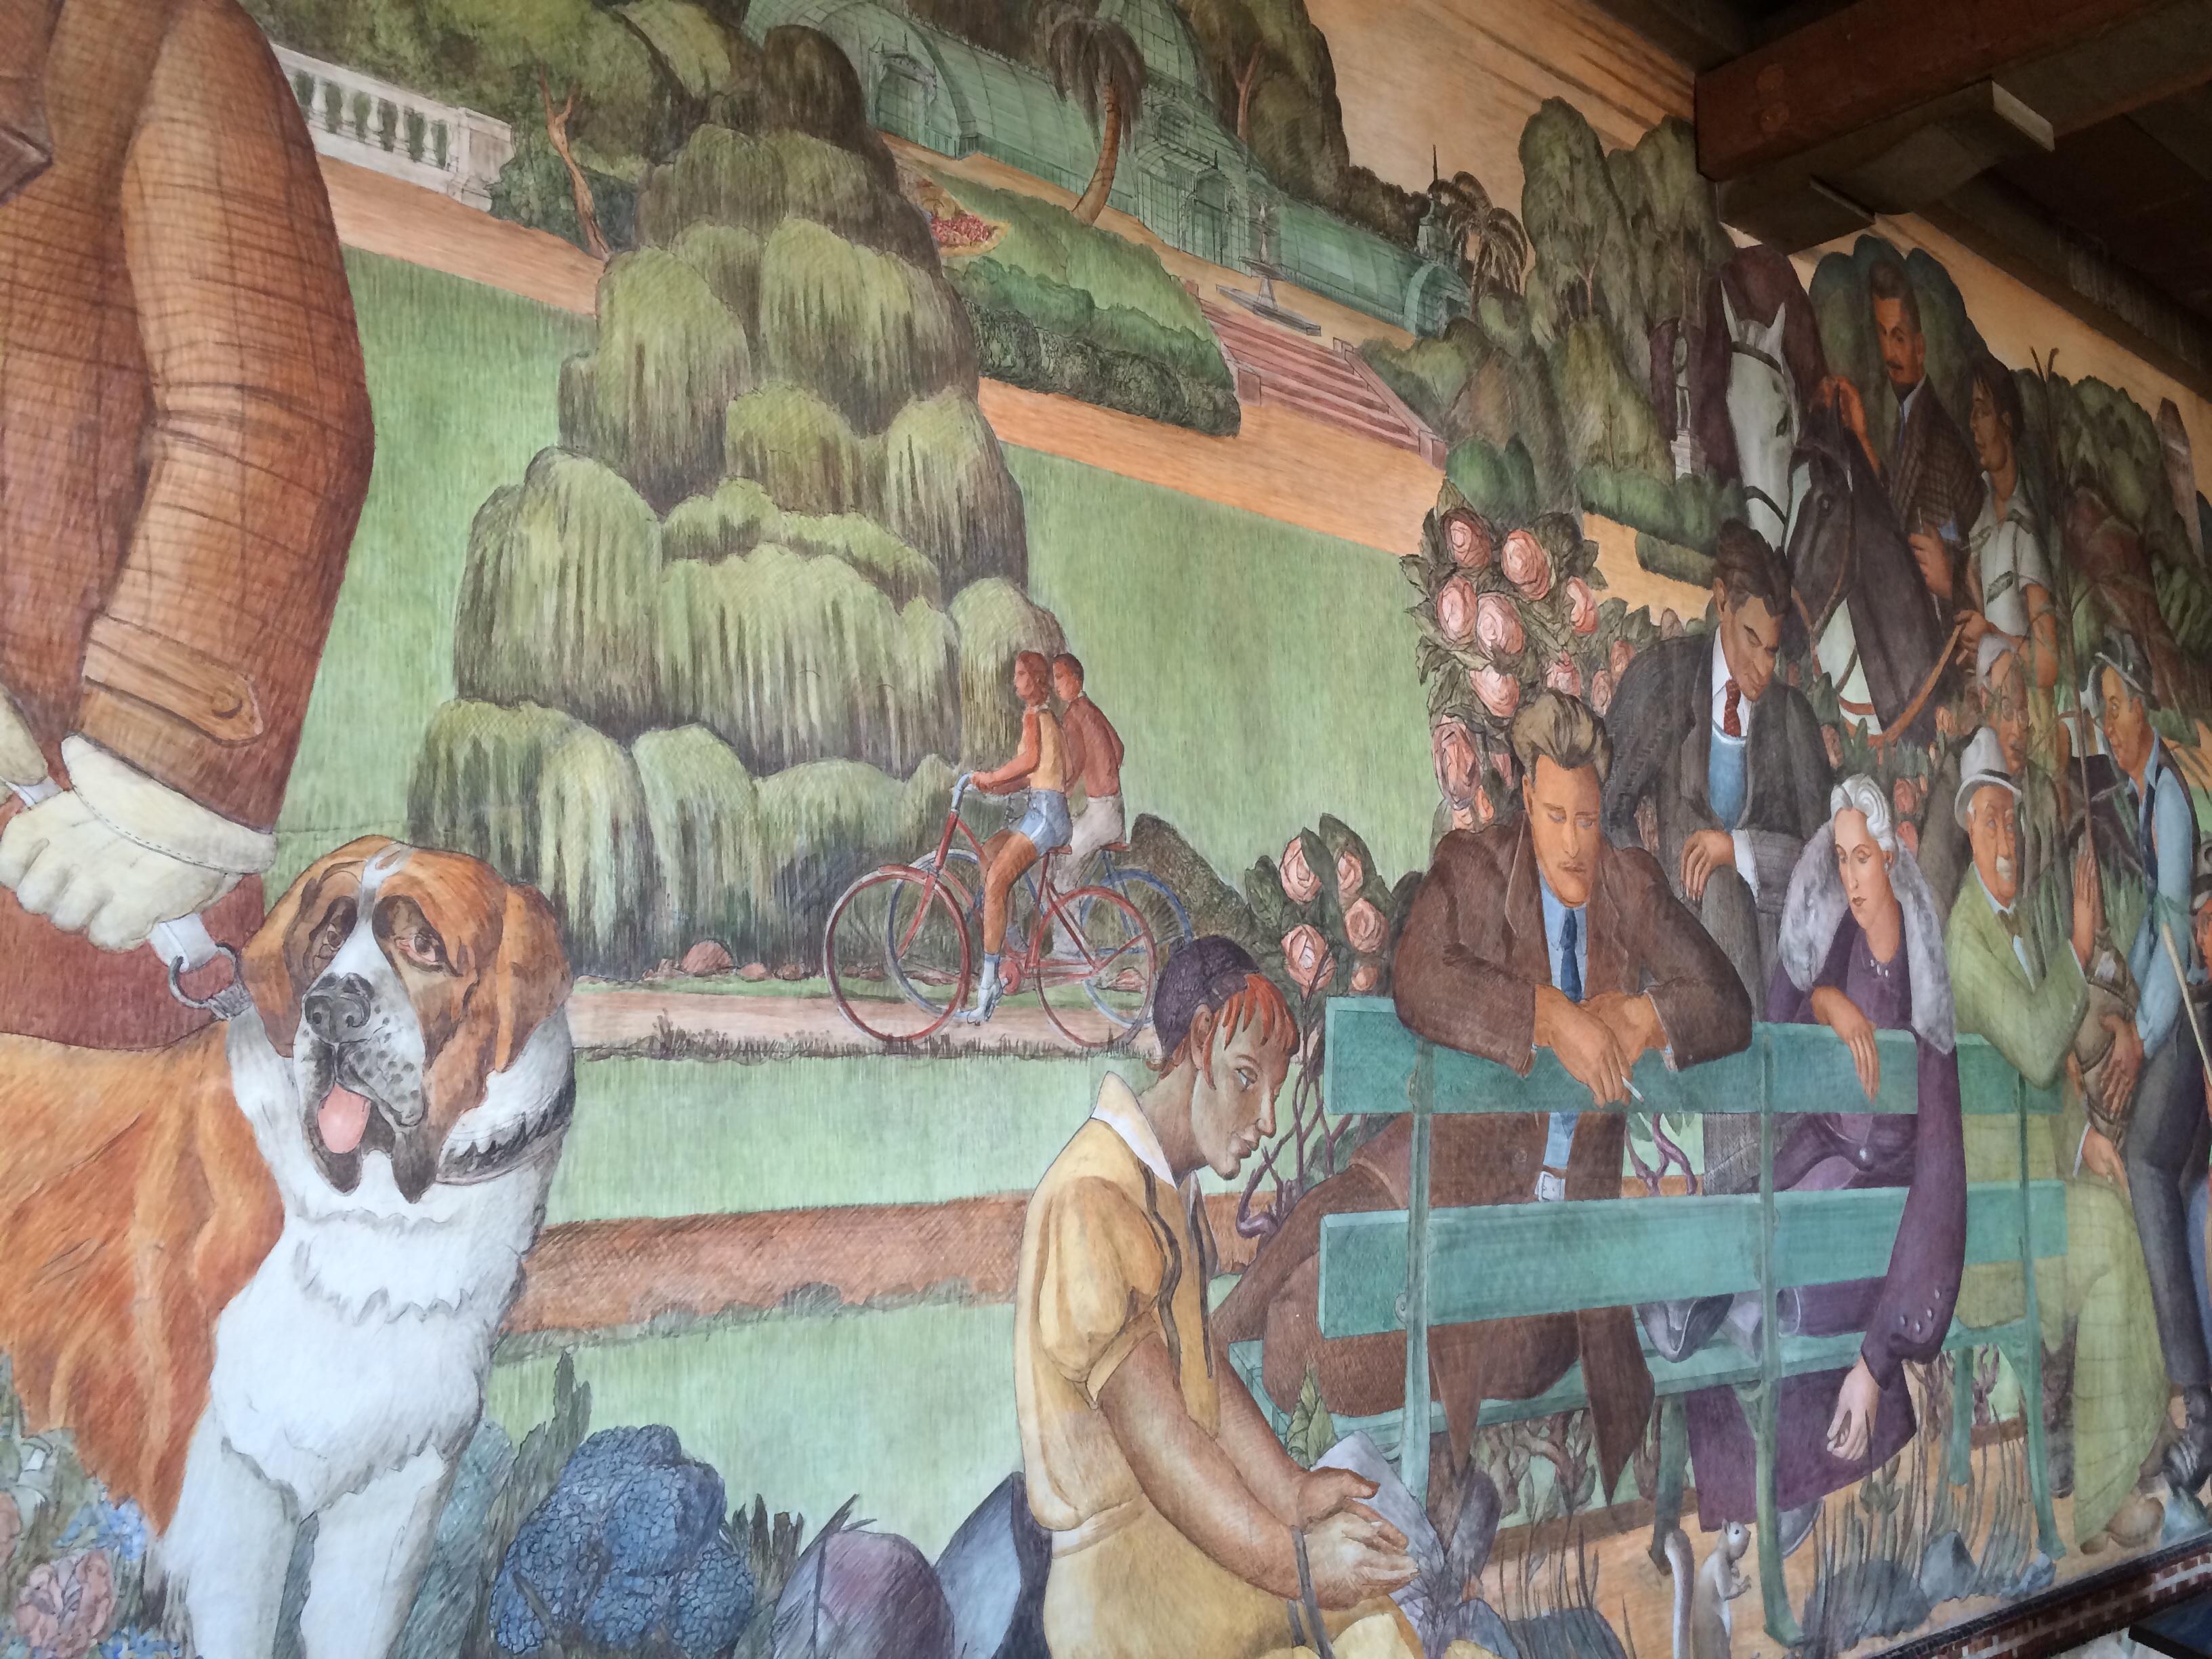 Lucien Labaudt mural